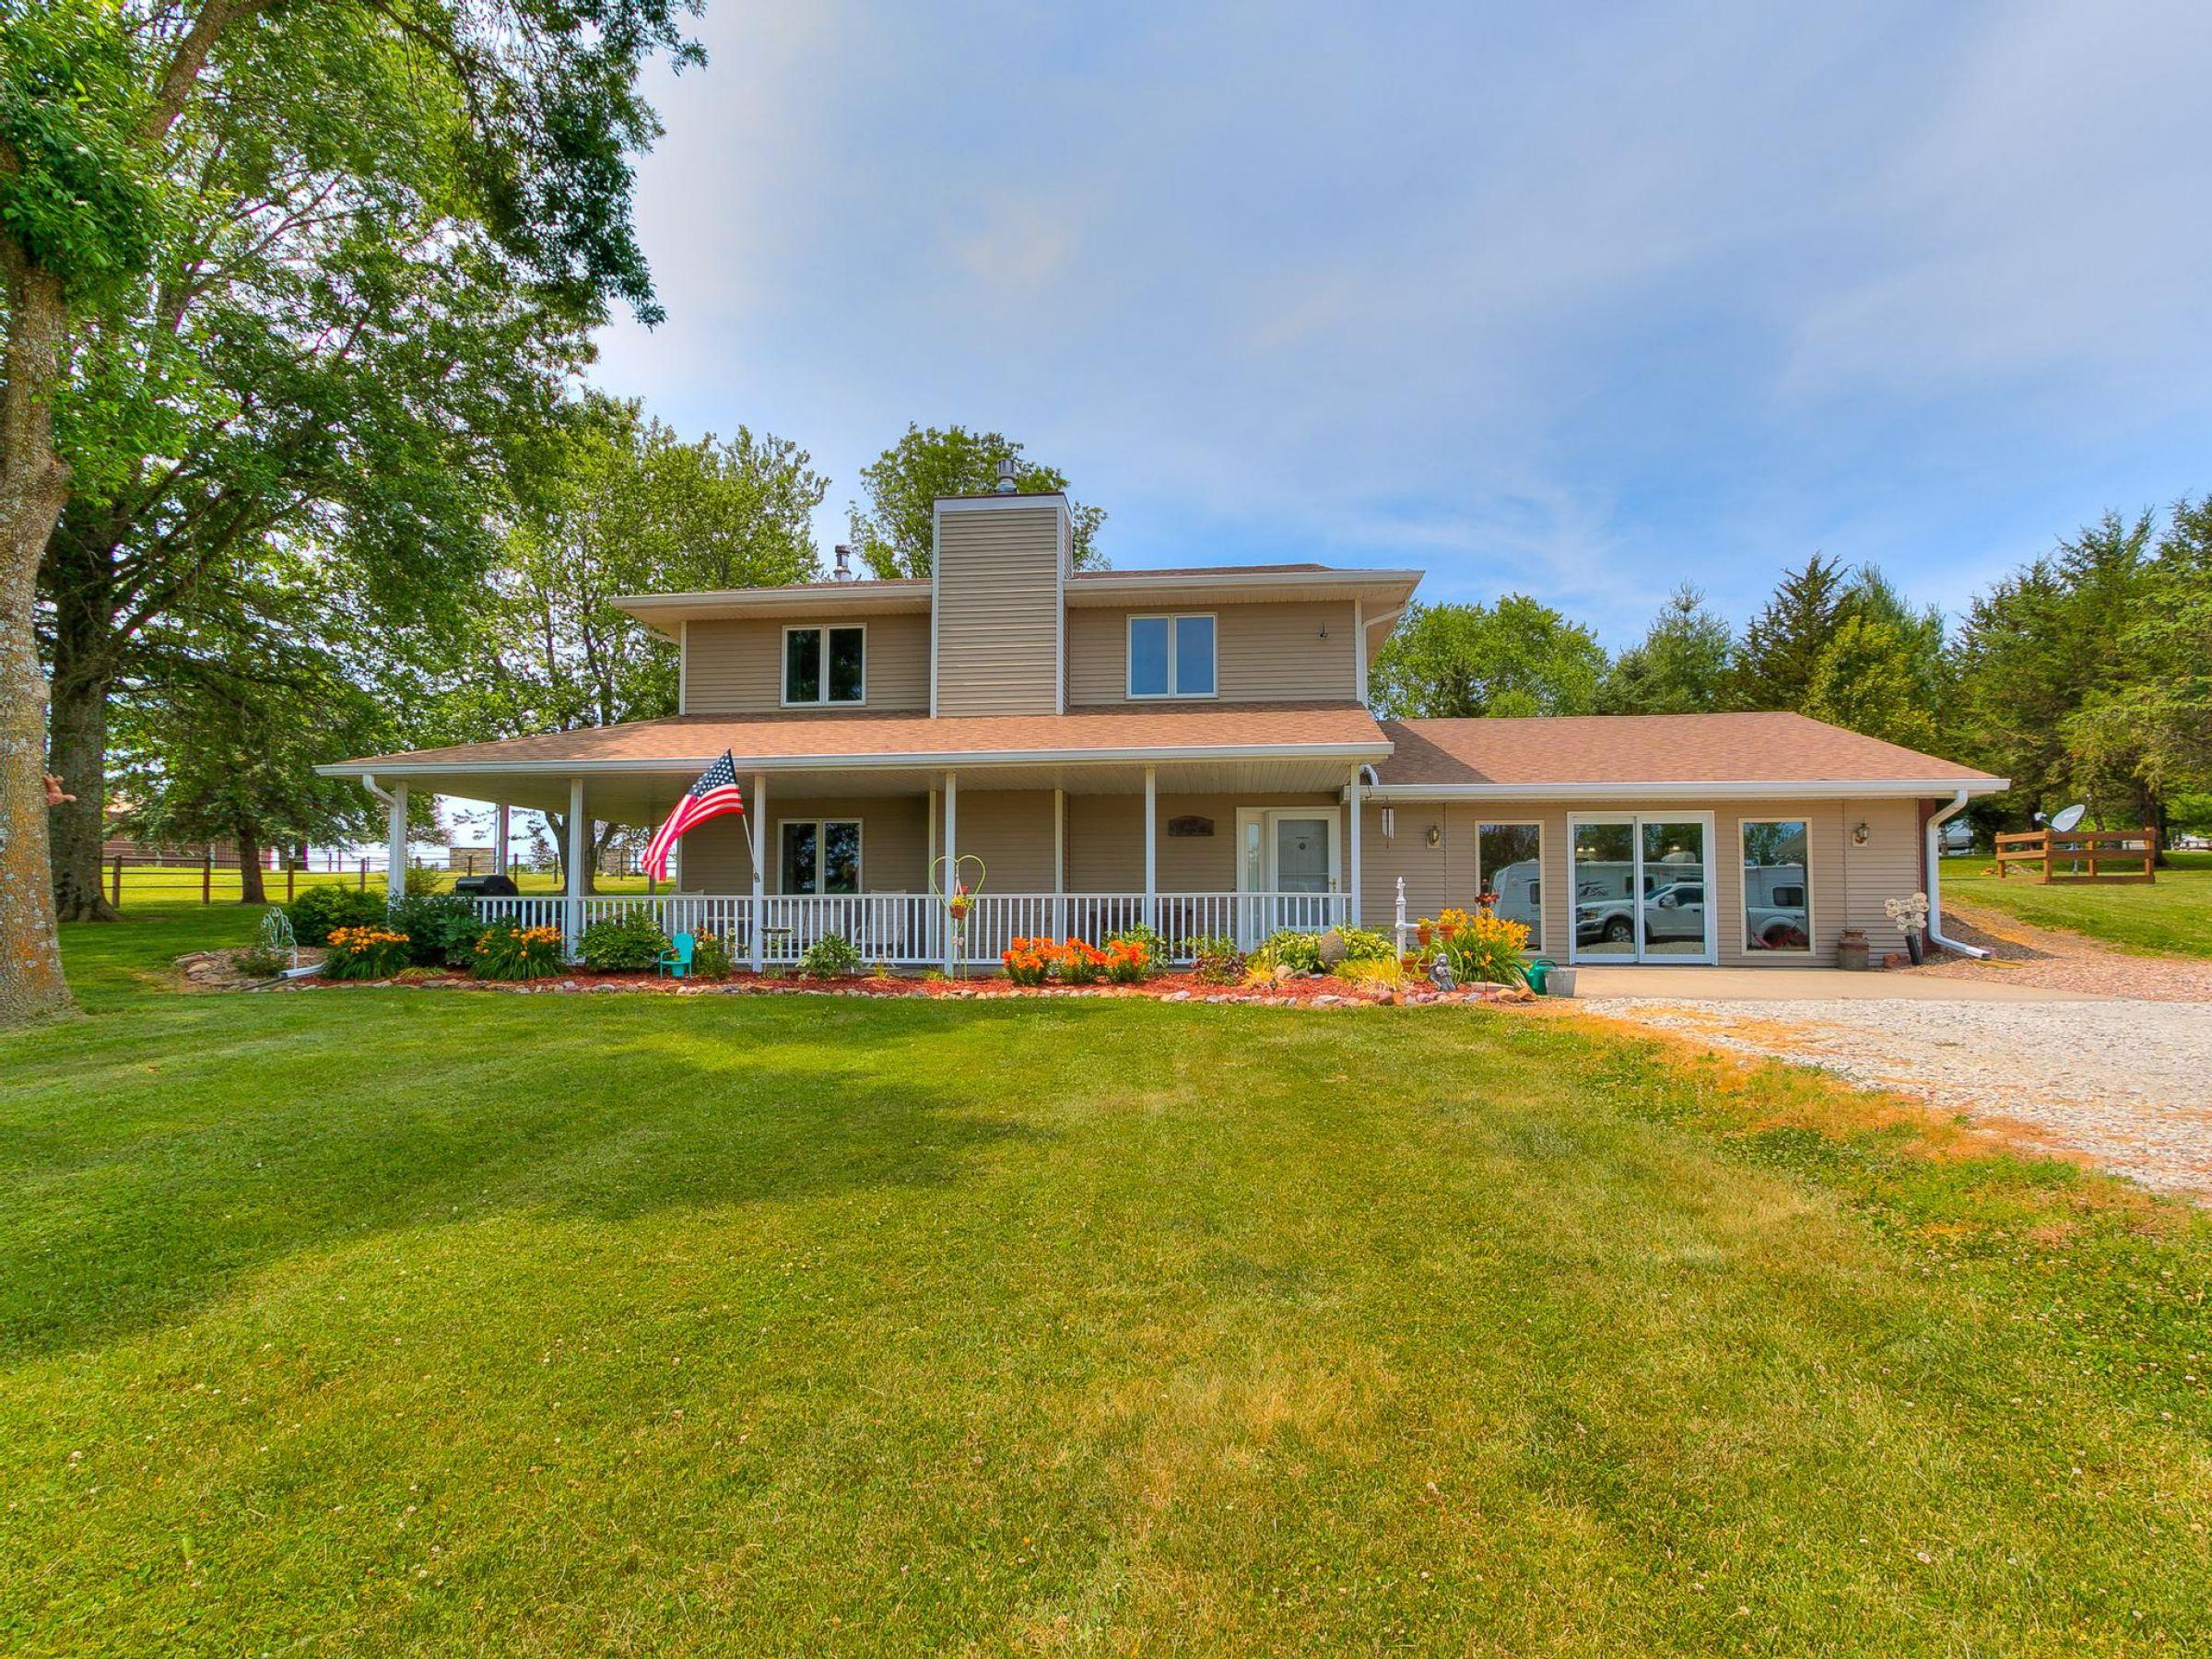 residential-warren-county-iowa-3-acres-listing-number-15593-2-2021-06-18-154522.jpg